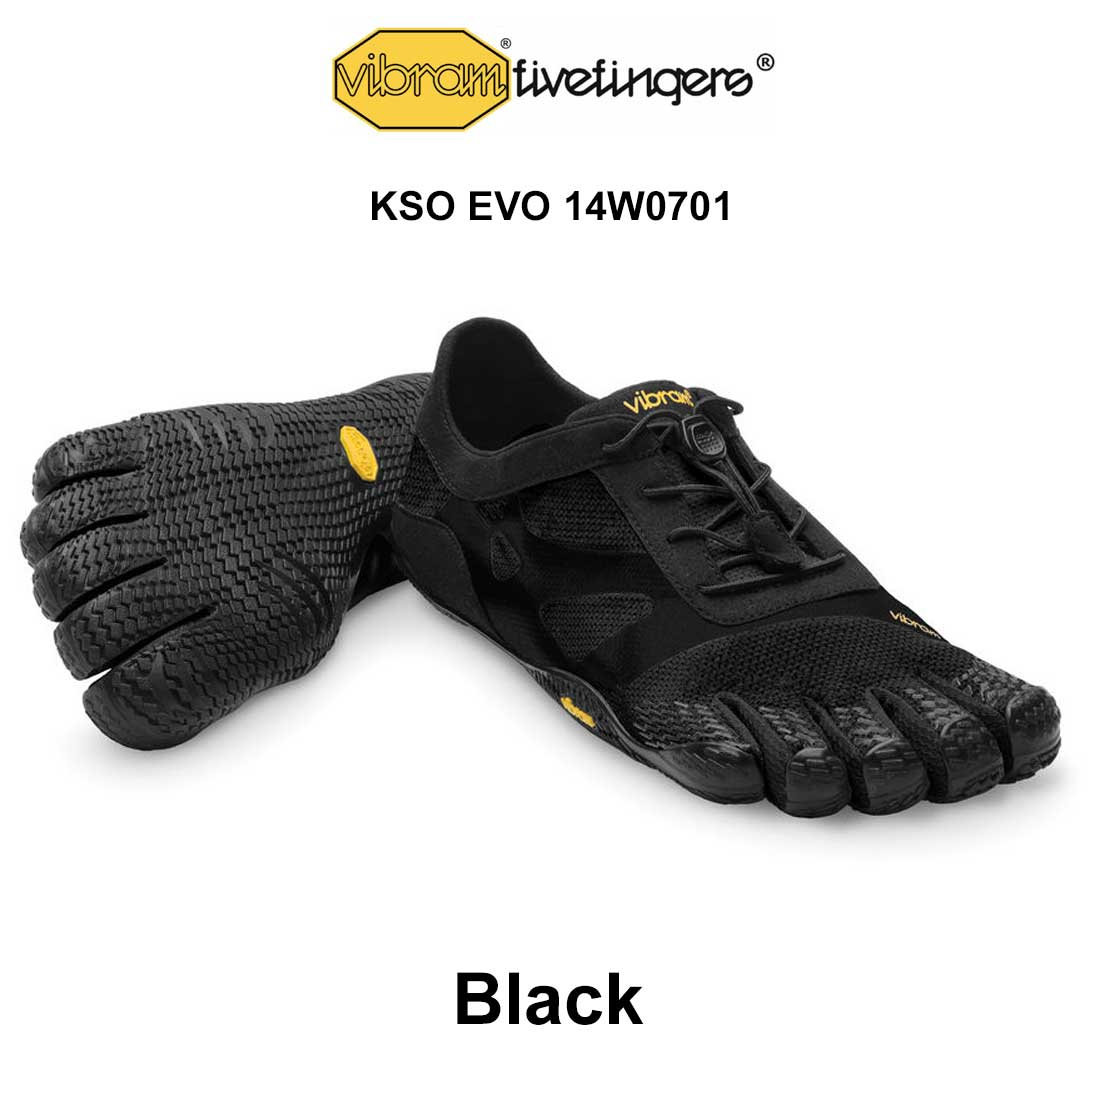 Vibram FiveFingers(ビブラムファイブフィンガーズ)レディース 五本指 シューズ KSO EVO 14W0701